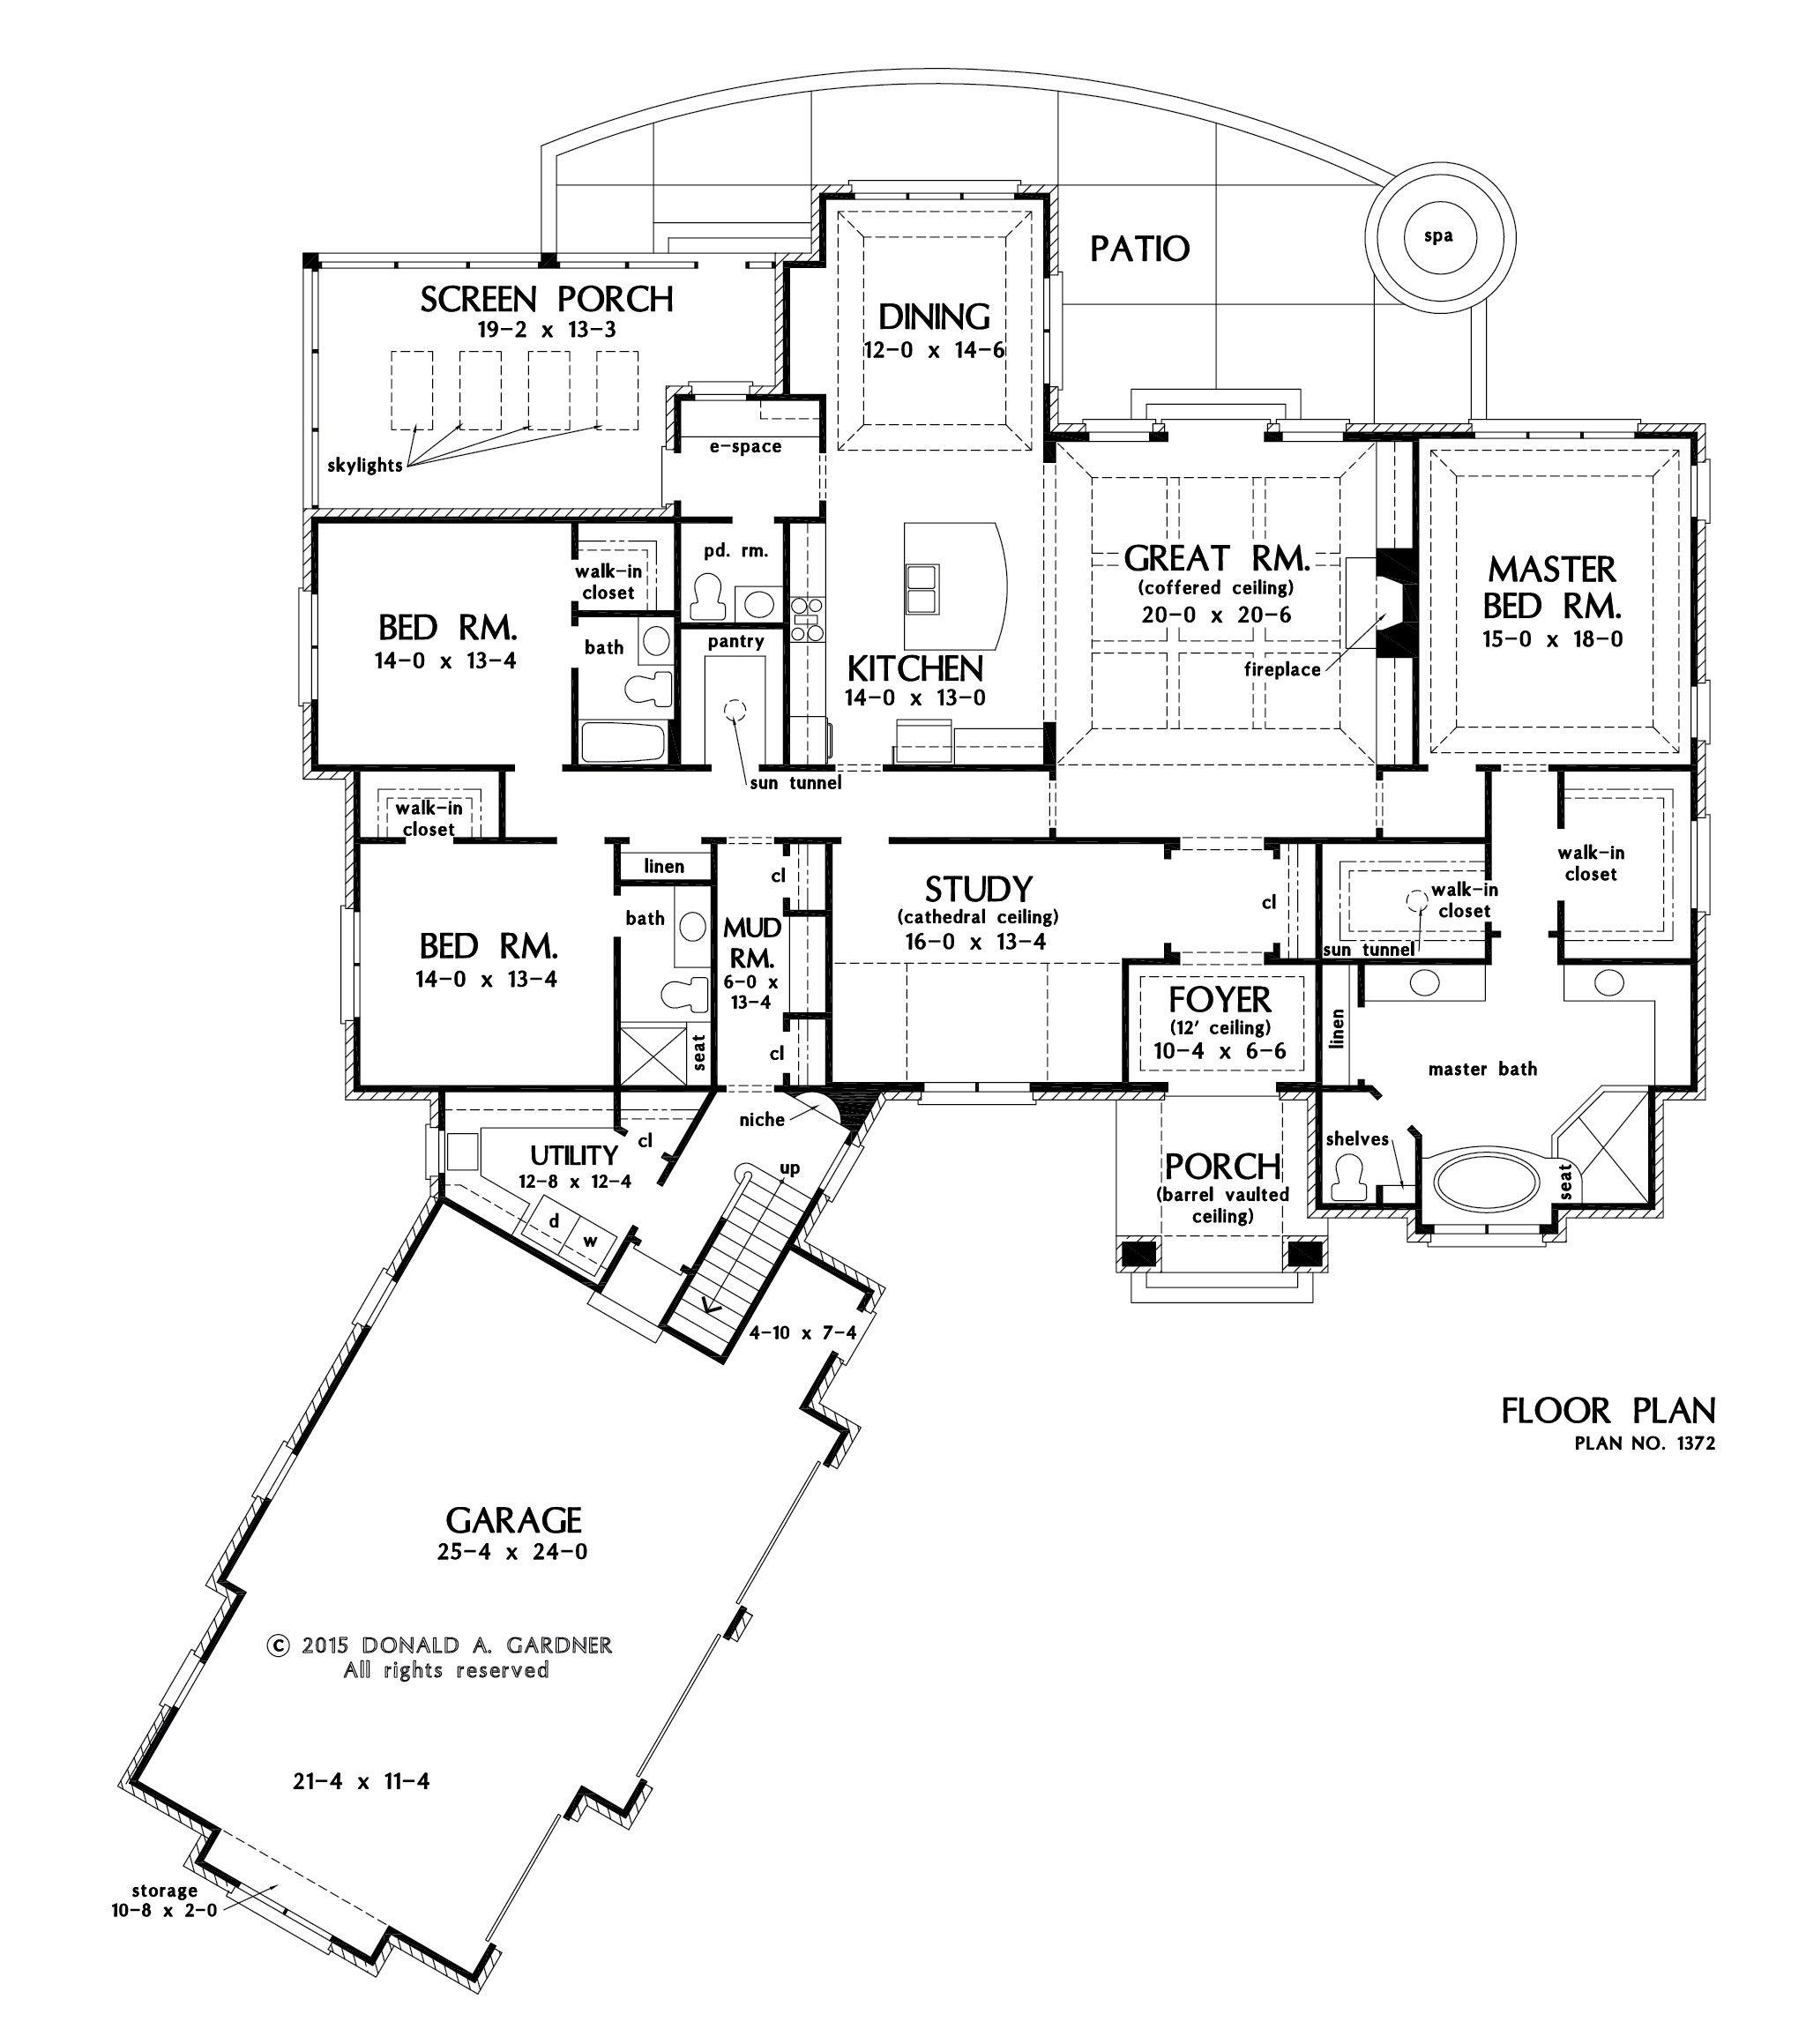 NEW HOUSE PLAN